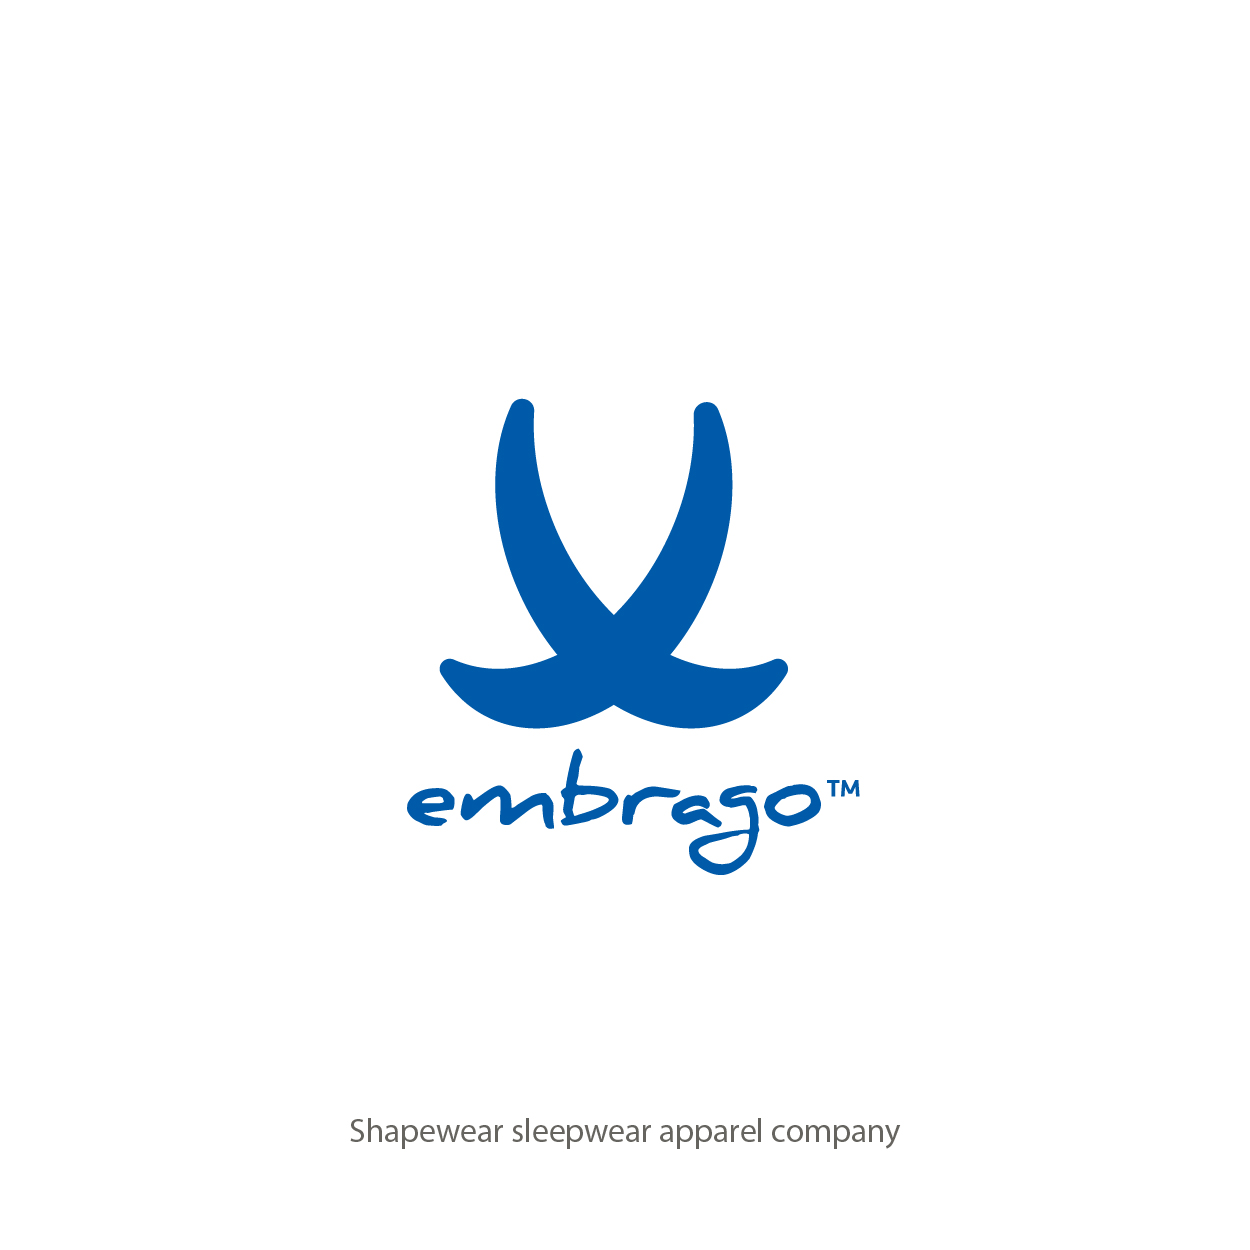 tjungle_design_logos-34Embrago.jpg